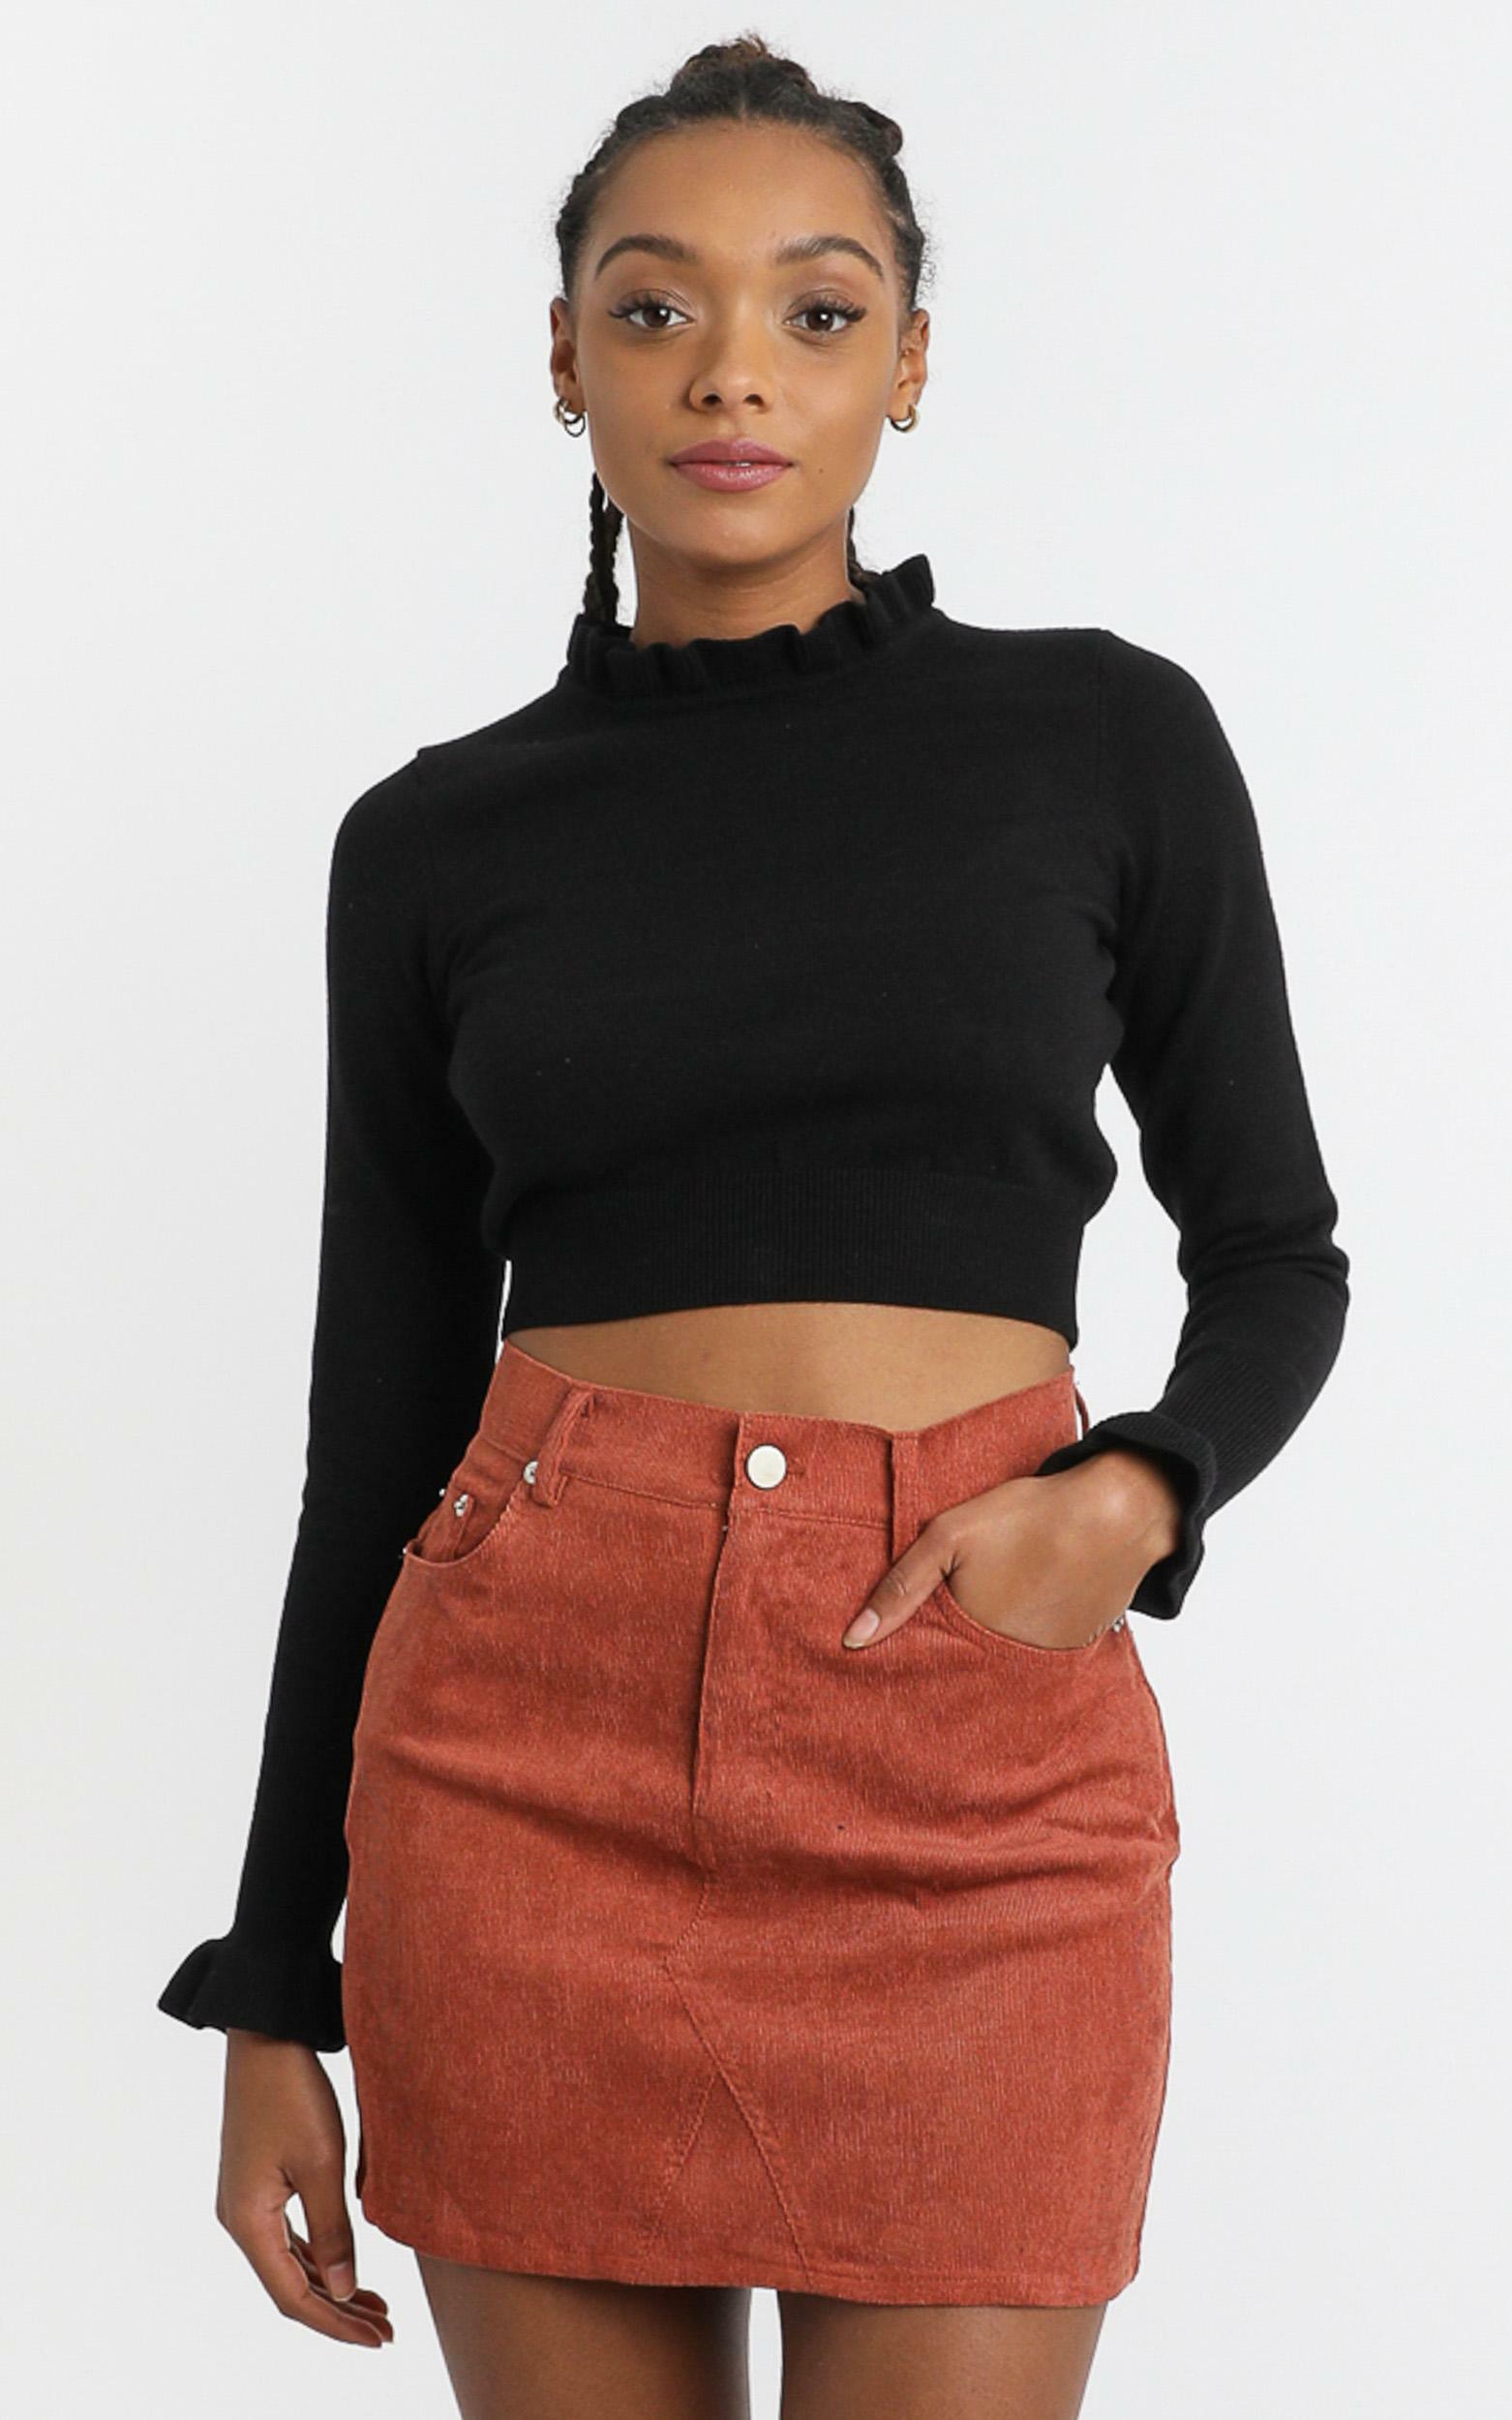 Aisha Skirt in Rust Corduroy - 6 (XS), Rust, hi-res image number null